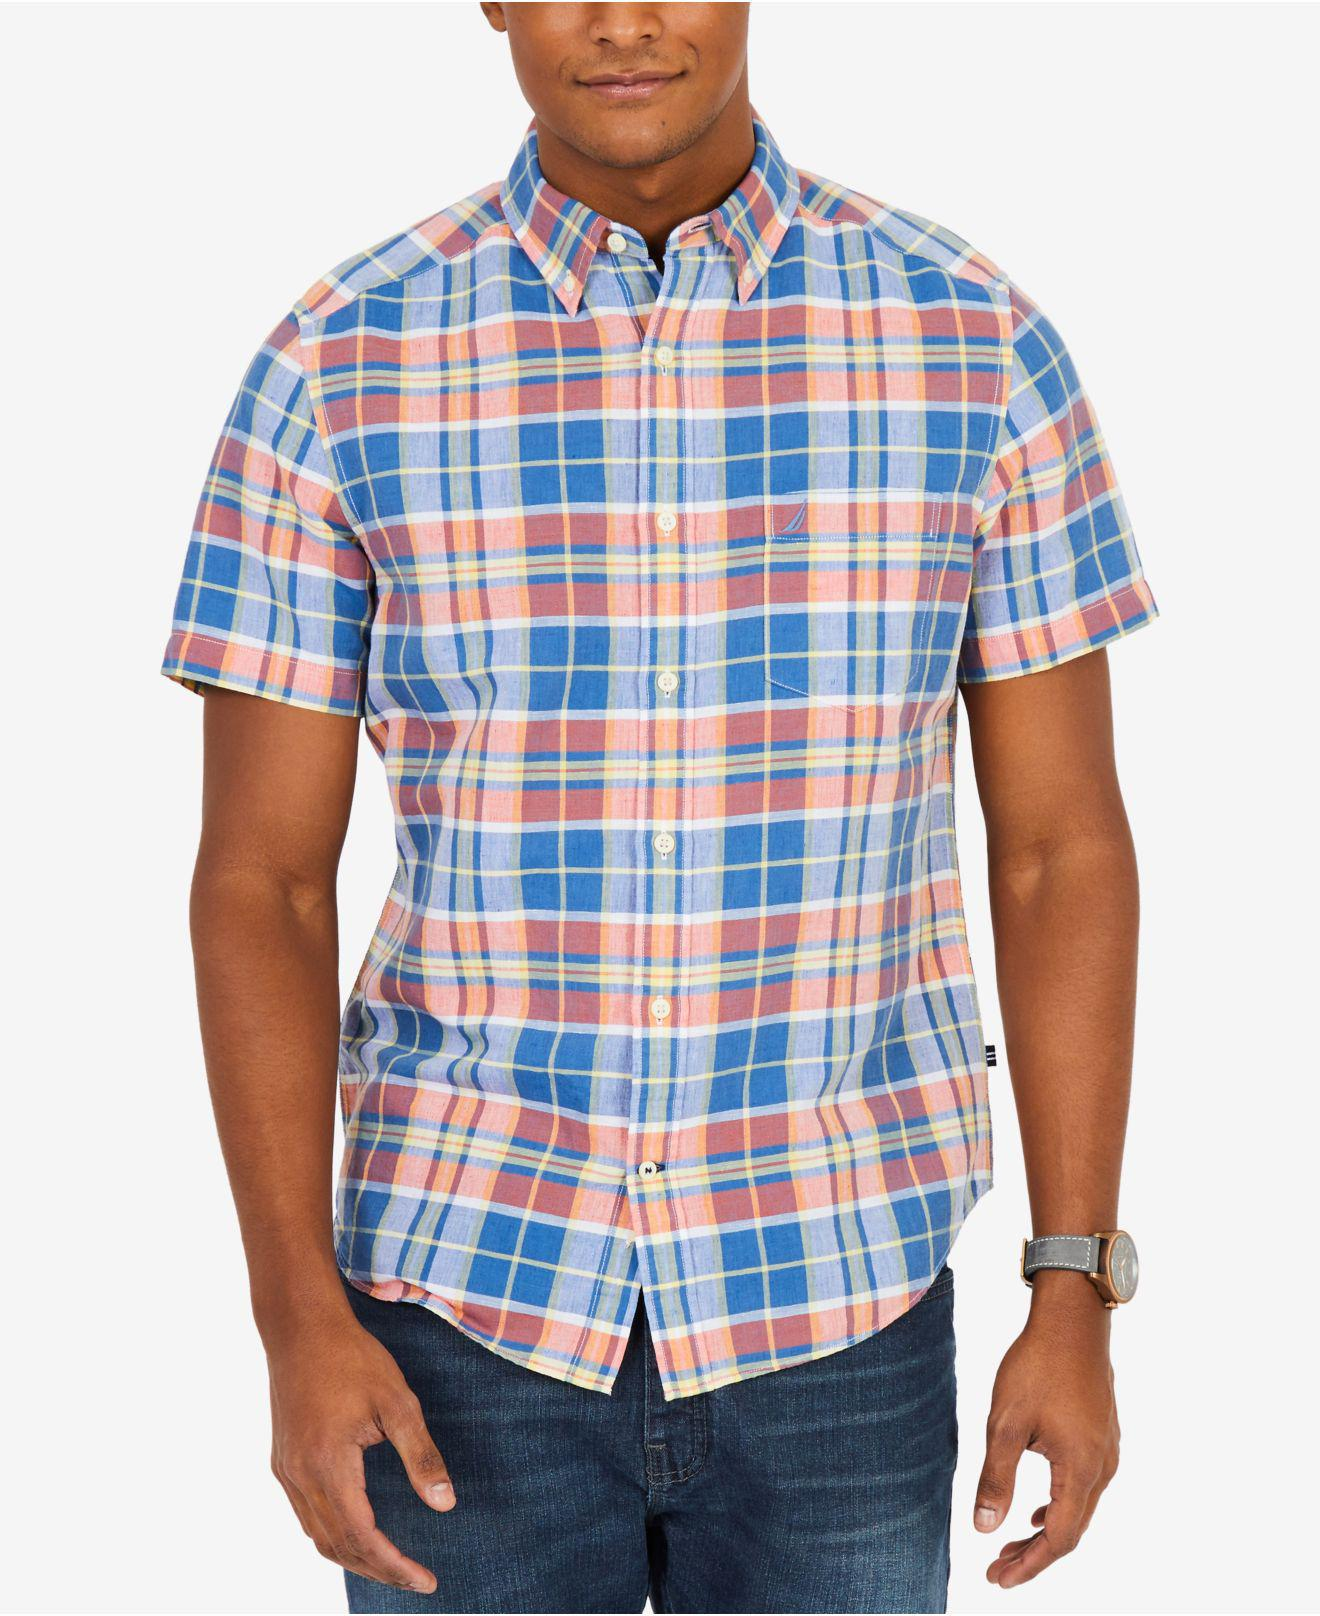 Lyst Nautica Plaid Short Sleeve Shirt In Blue For Men